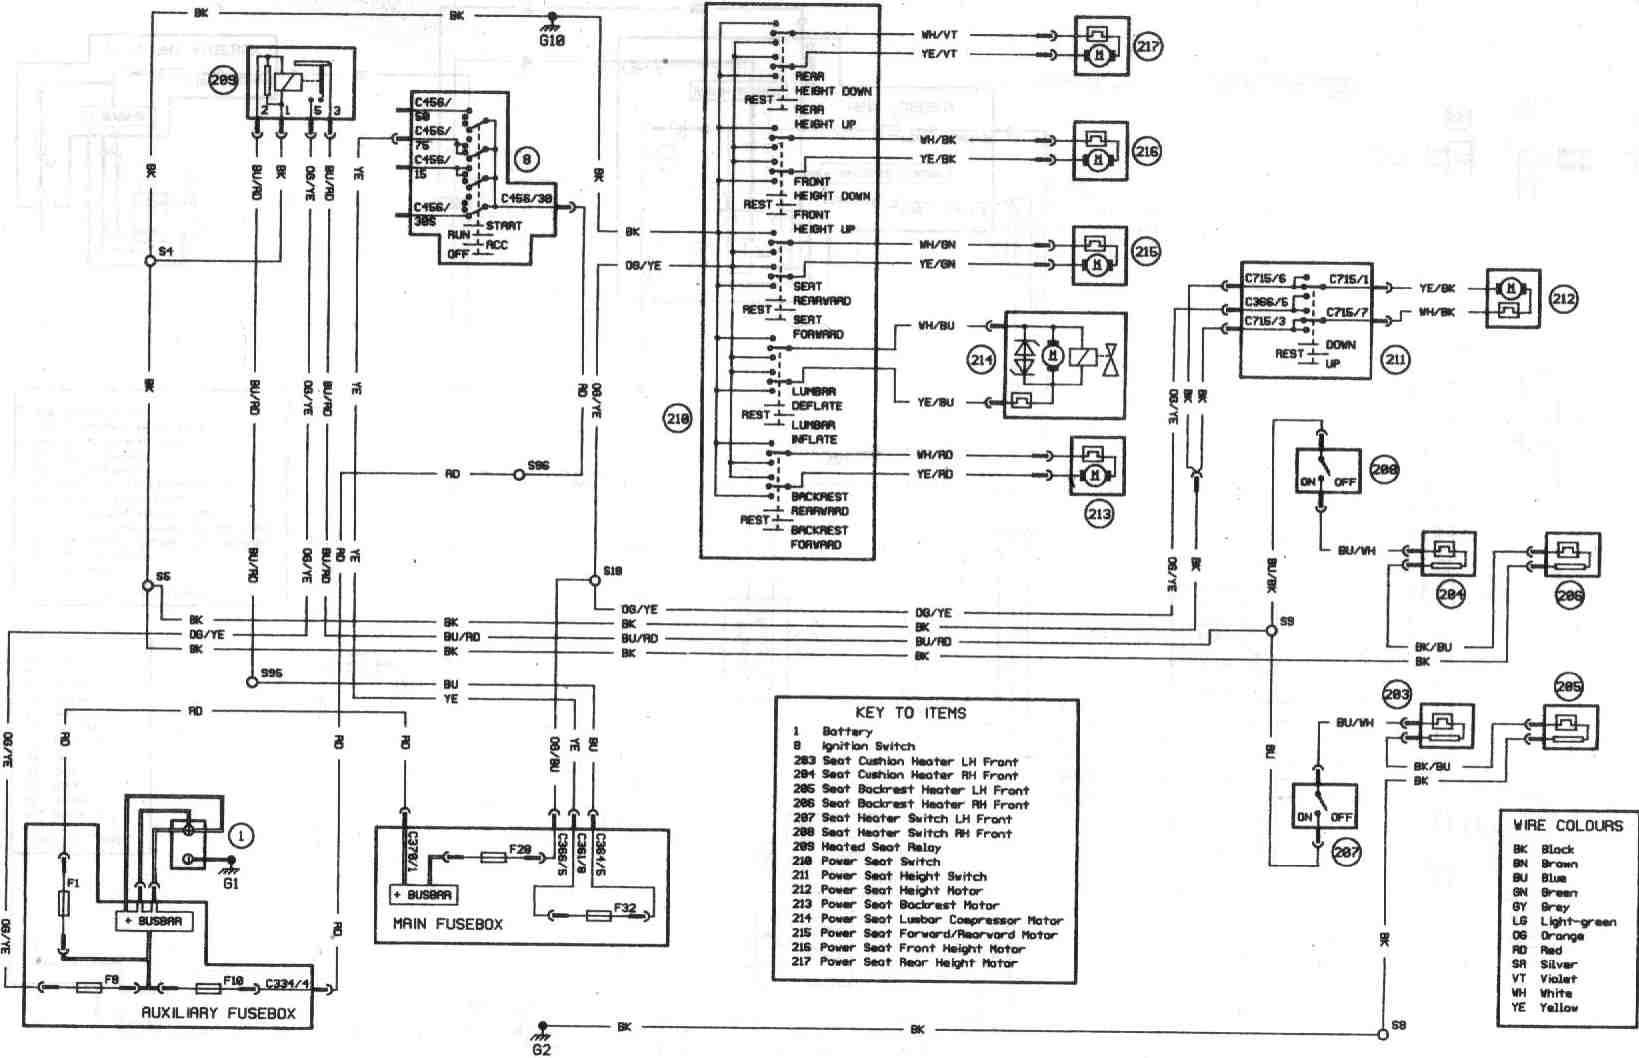 ford b max wiring diagram cg 6277  ford mondeo mk4 wiring diagram photo  cg 6277  ford mondeo mk4 wiring diagram